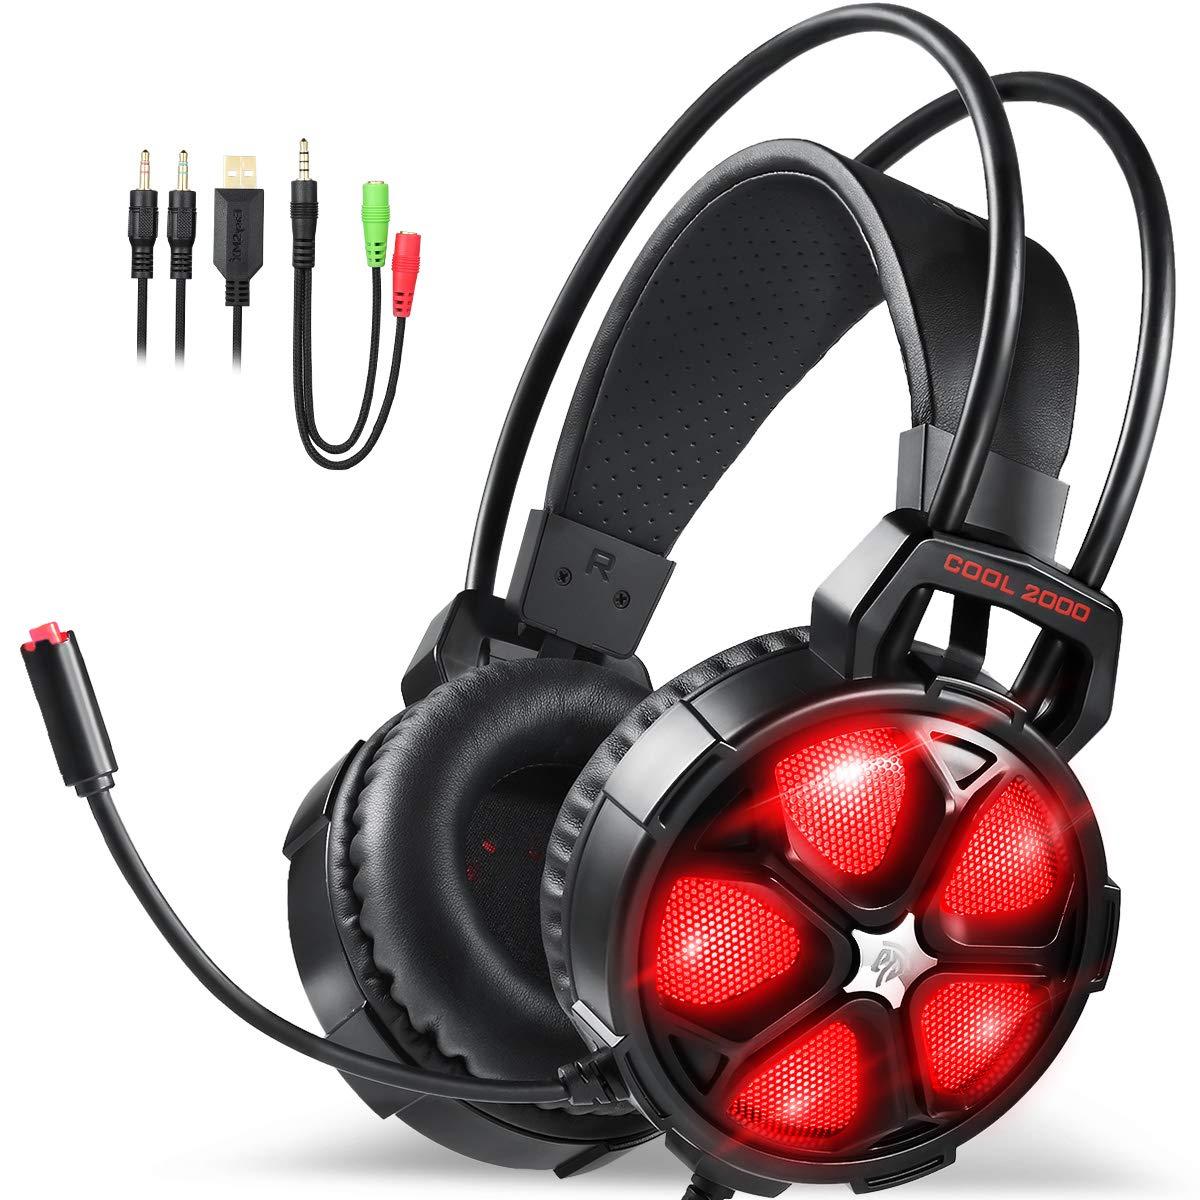 JAMSWALL Gaming Headset 3.5mm Wired Over-head Cuffie stereo con microfono  Microfono Controllo volume per ... 6d76d611820a